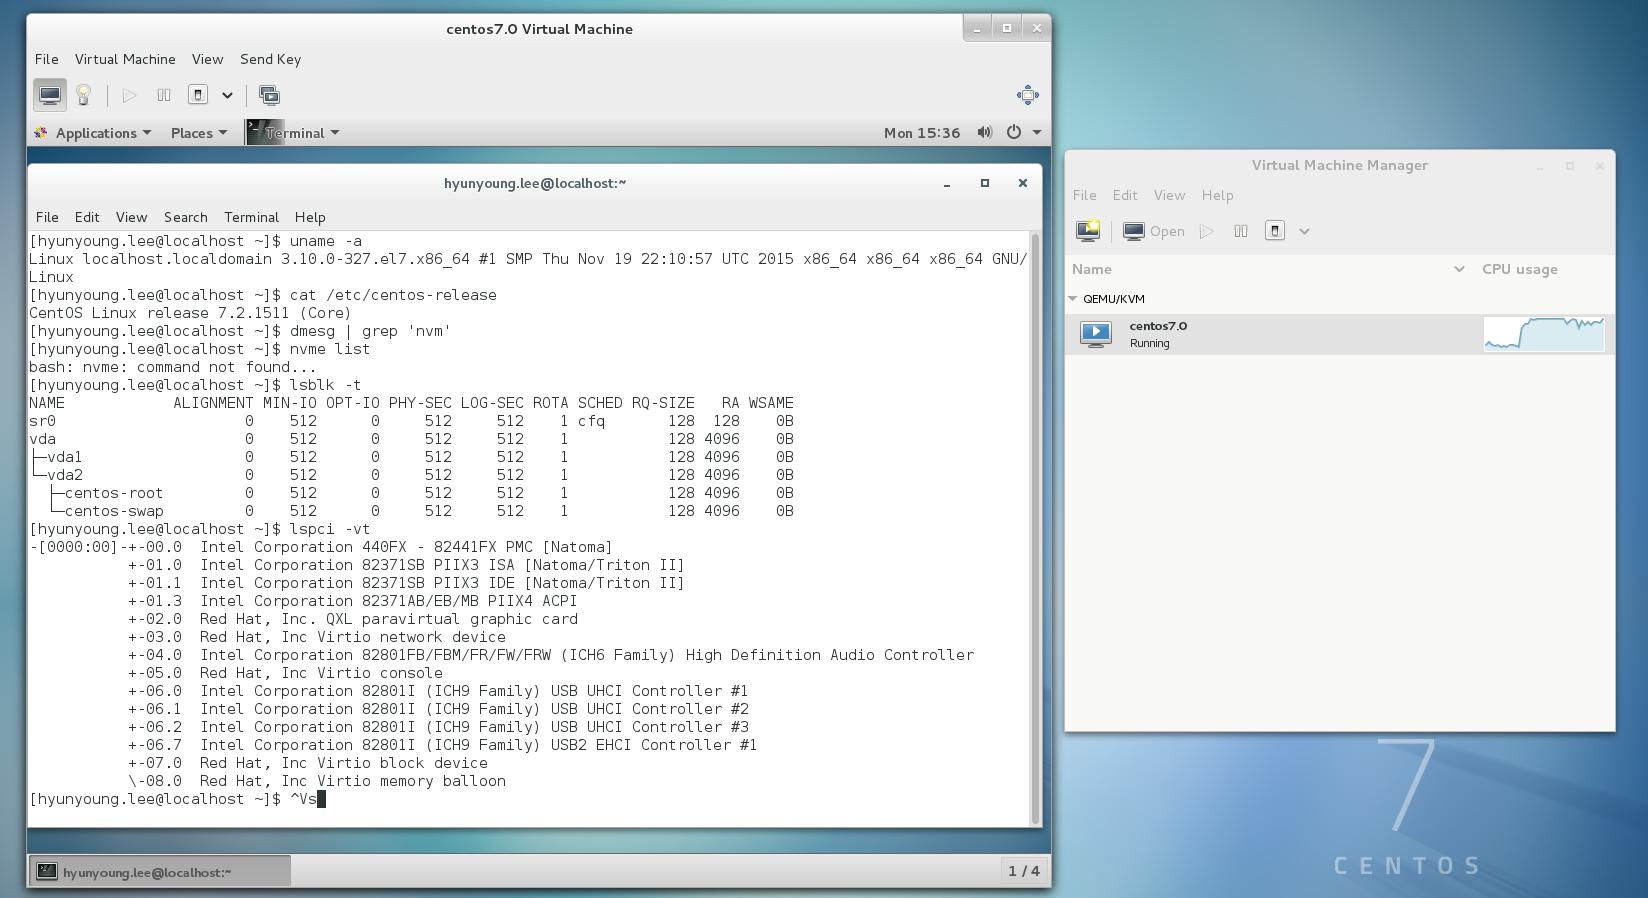 QEMU(Generic and Open Source Machine emulator and